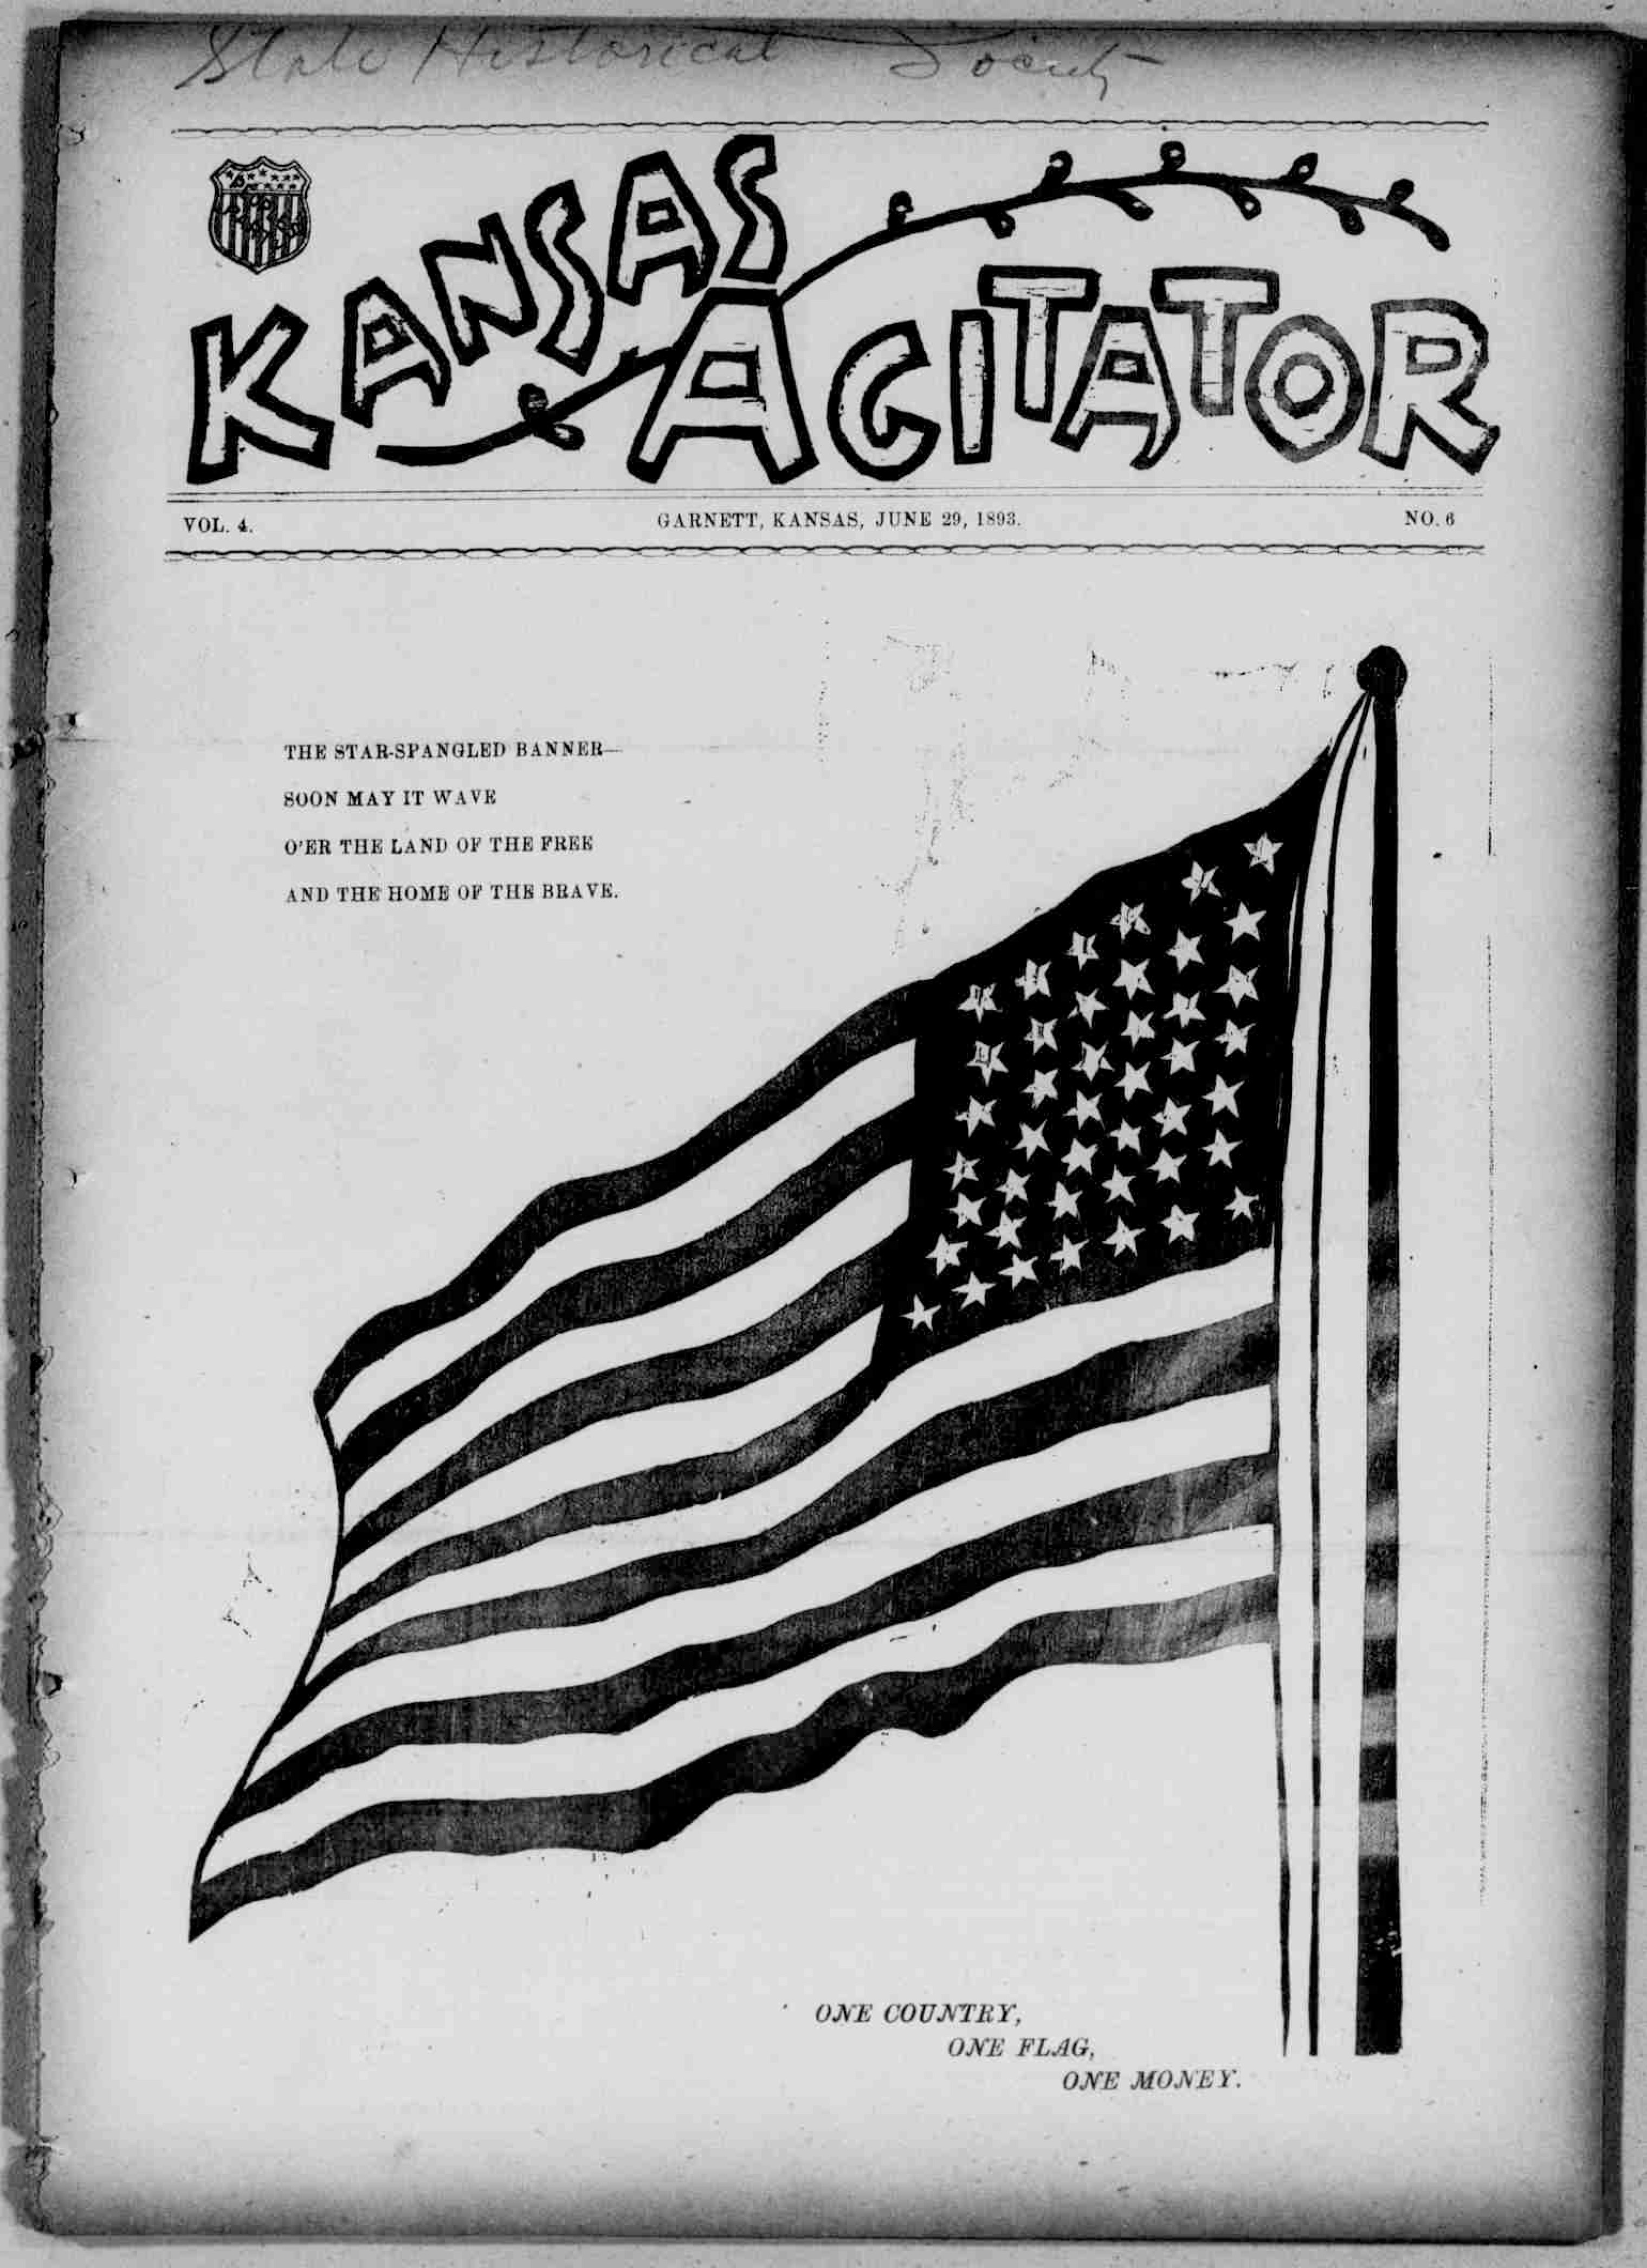 Kansas Agitator. (Garnett, Kan.), June 29, 1893.Front page news: The panic of 1893 and populism.